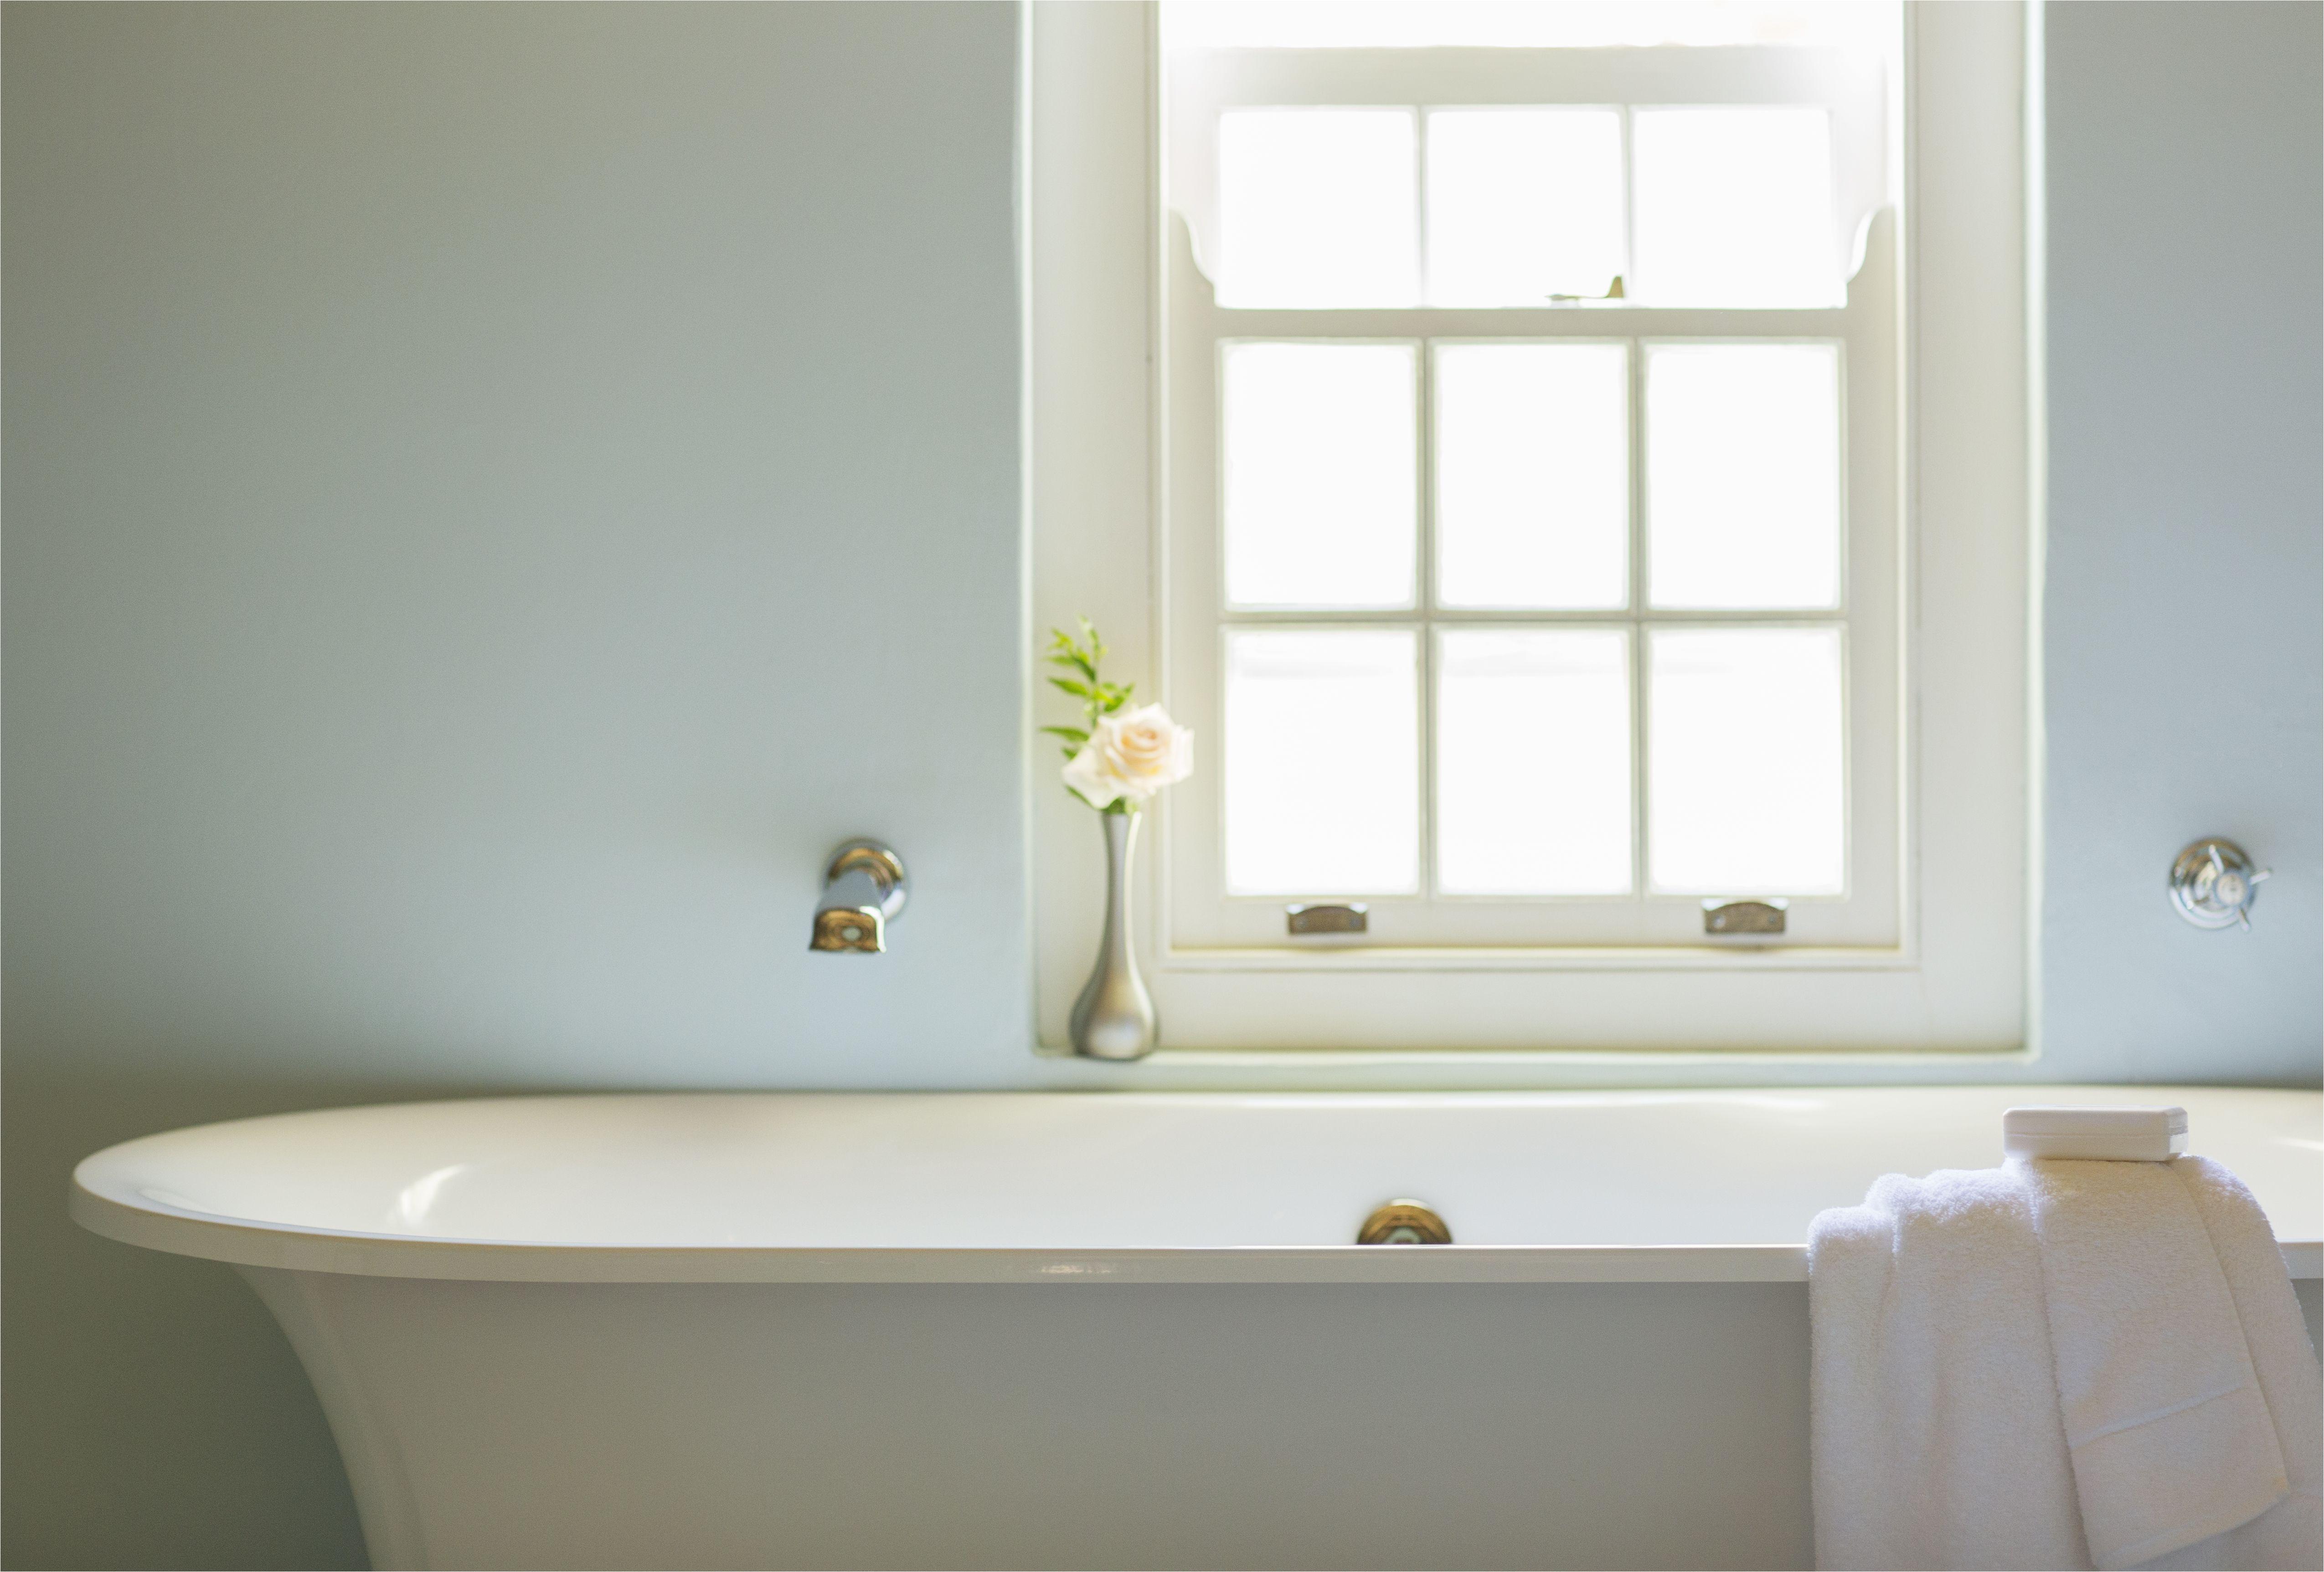 How to Clean Fiberglass Bathtub How to Choose the Best Bathtub Fiberglass Vs Cast Iron